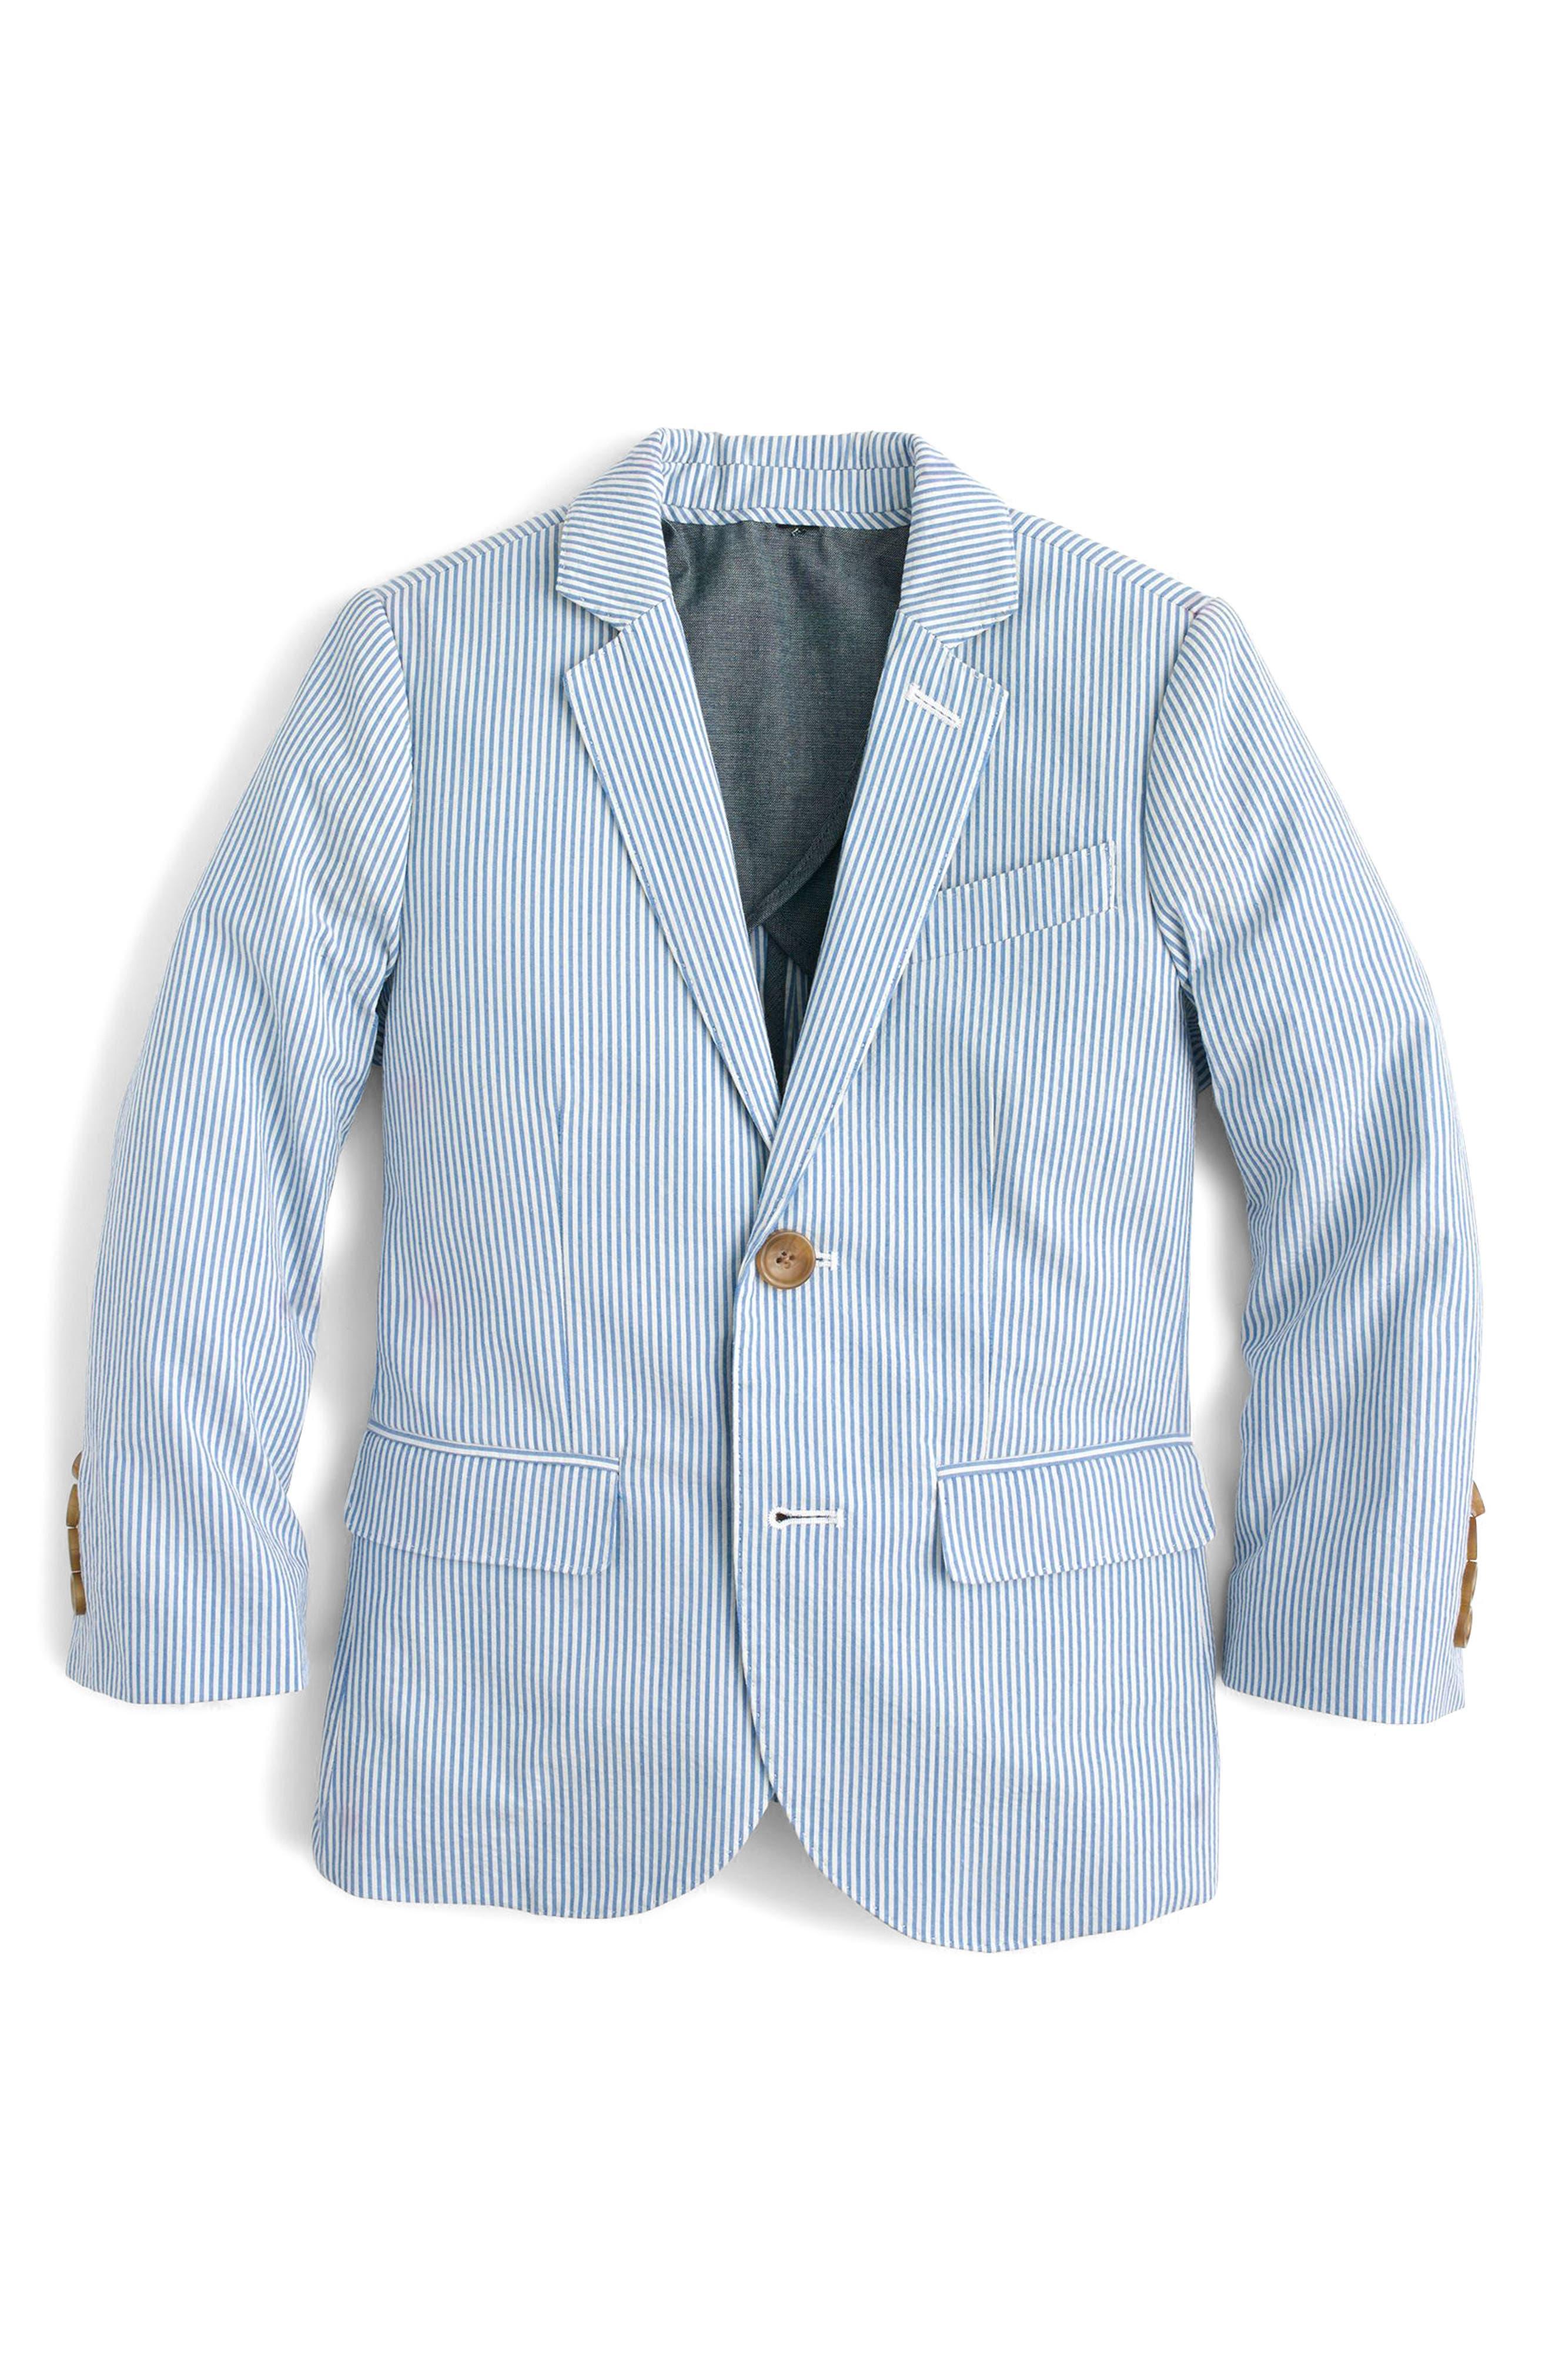 crewcuts by J.Crew Ludlow Seersucker Suit Jacket (Toddler Boys, Little Boys & Big Boys)